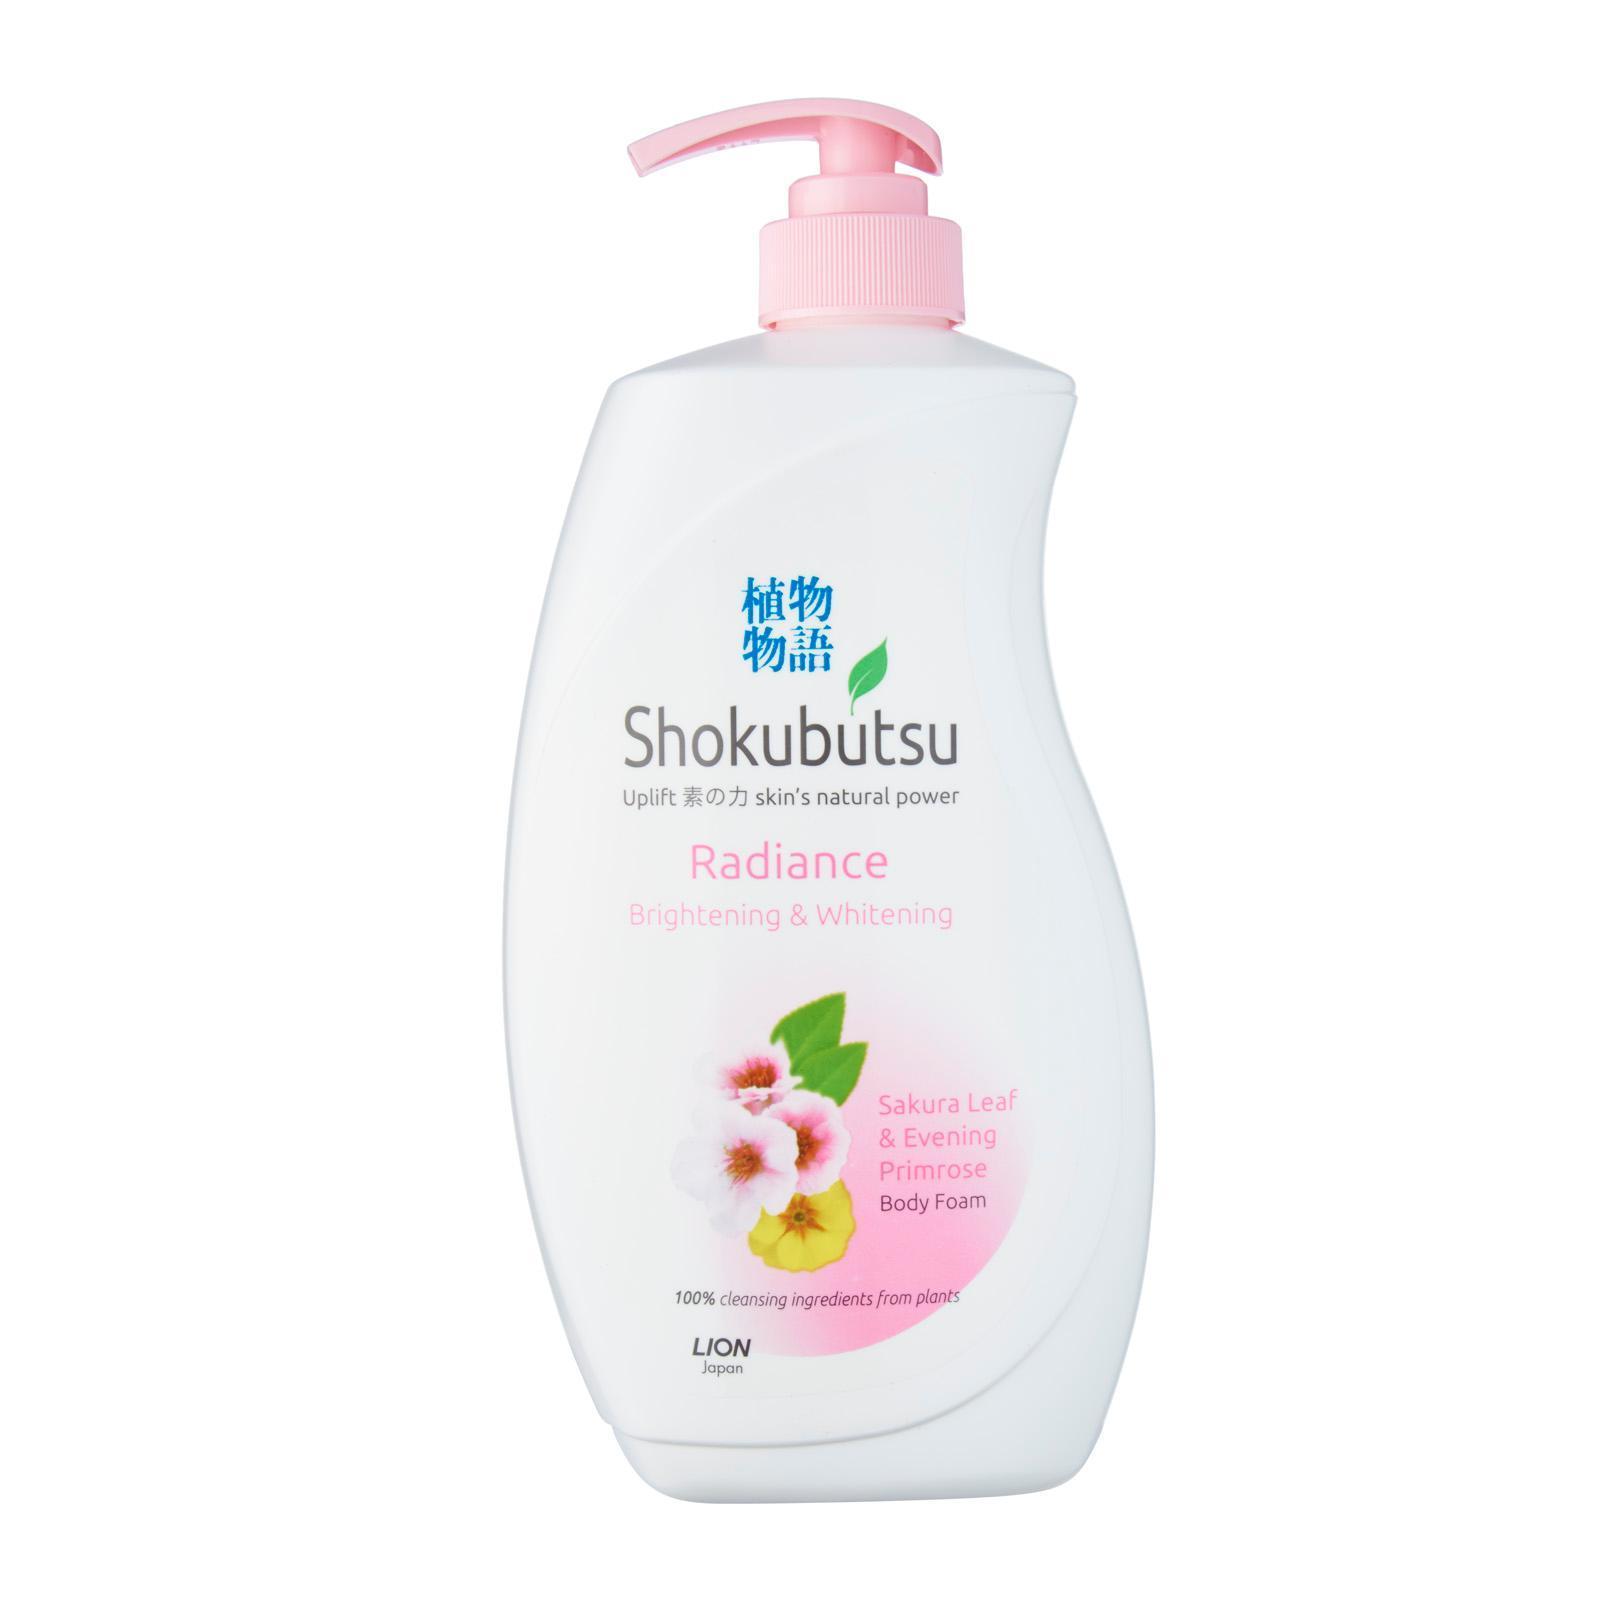 Shokubutsu Radiance Body Foam - Brightening and Whitening